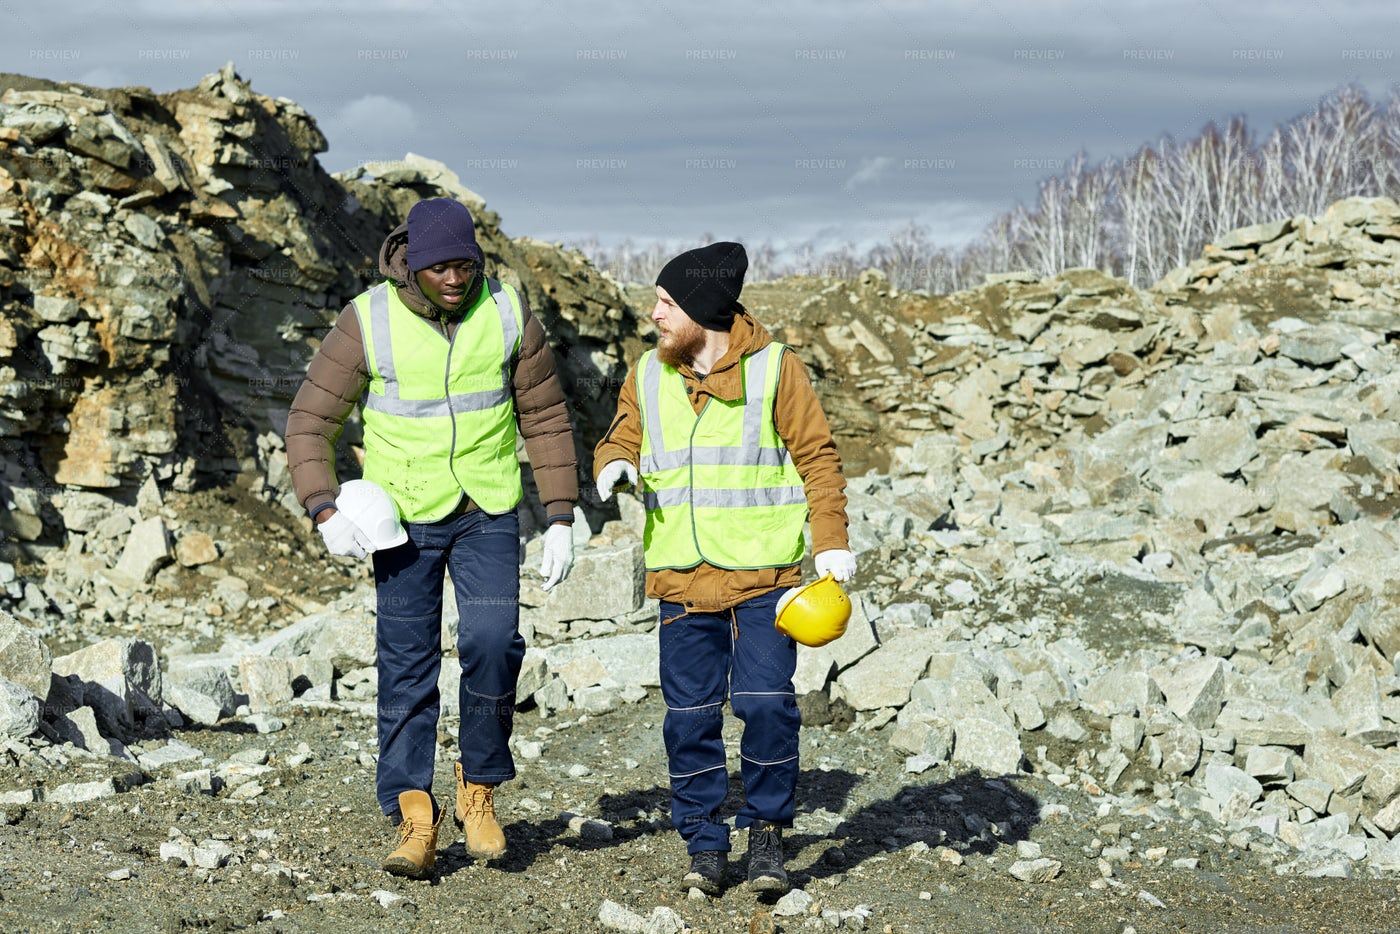 Workers Walking On Site In Alaska: Stock Photos